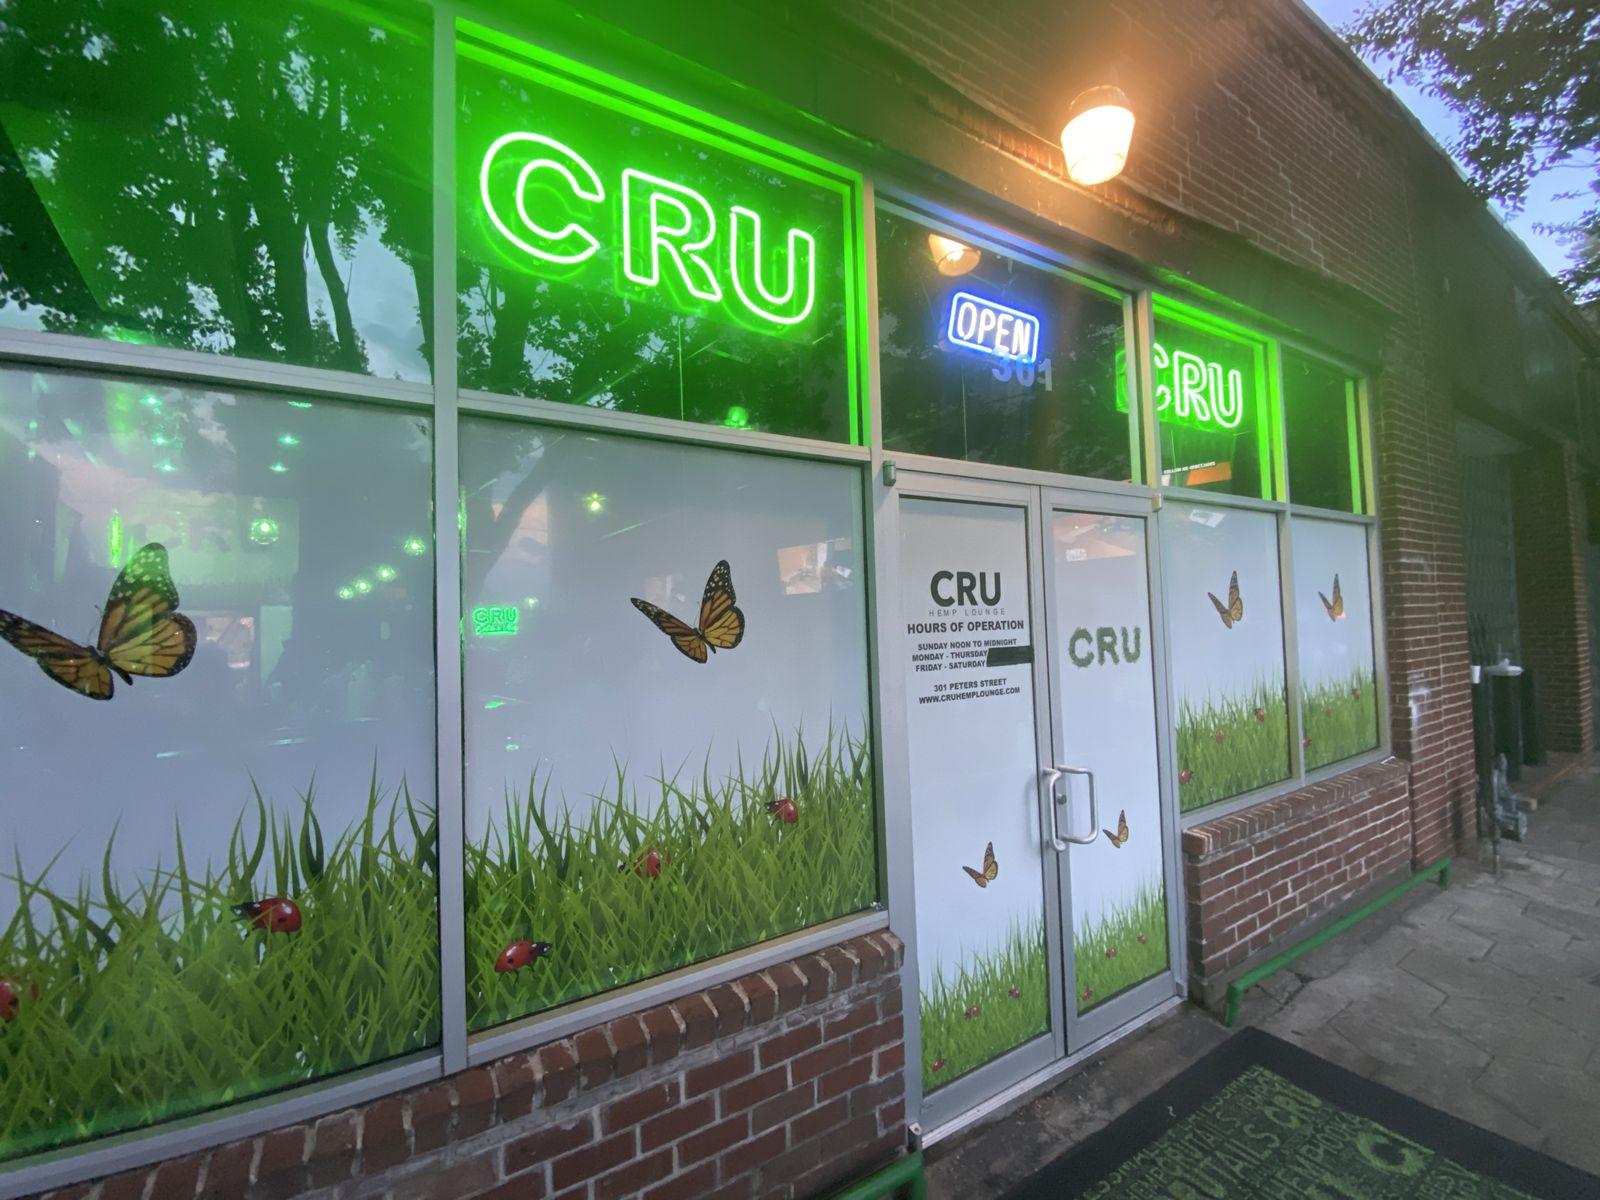 Cru Hemp Lounge: Taking over the U.S. Lifestyle Lounge Space